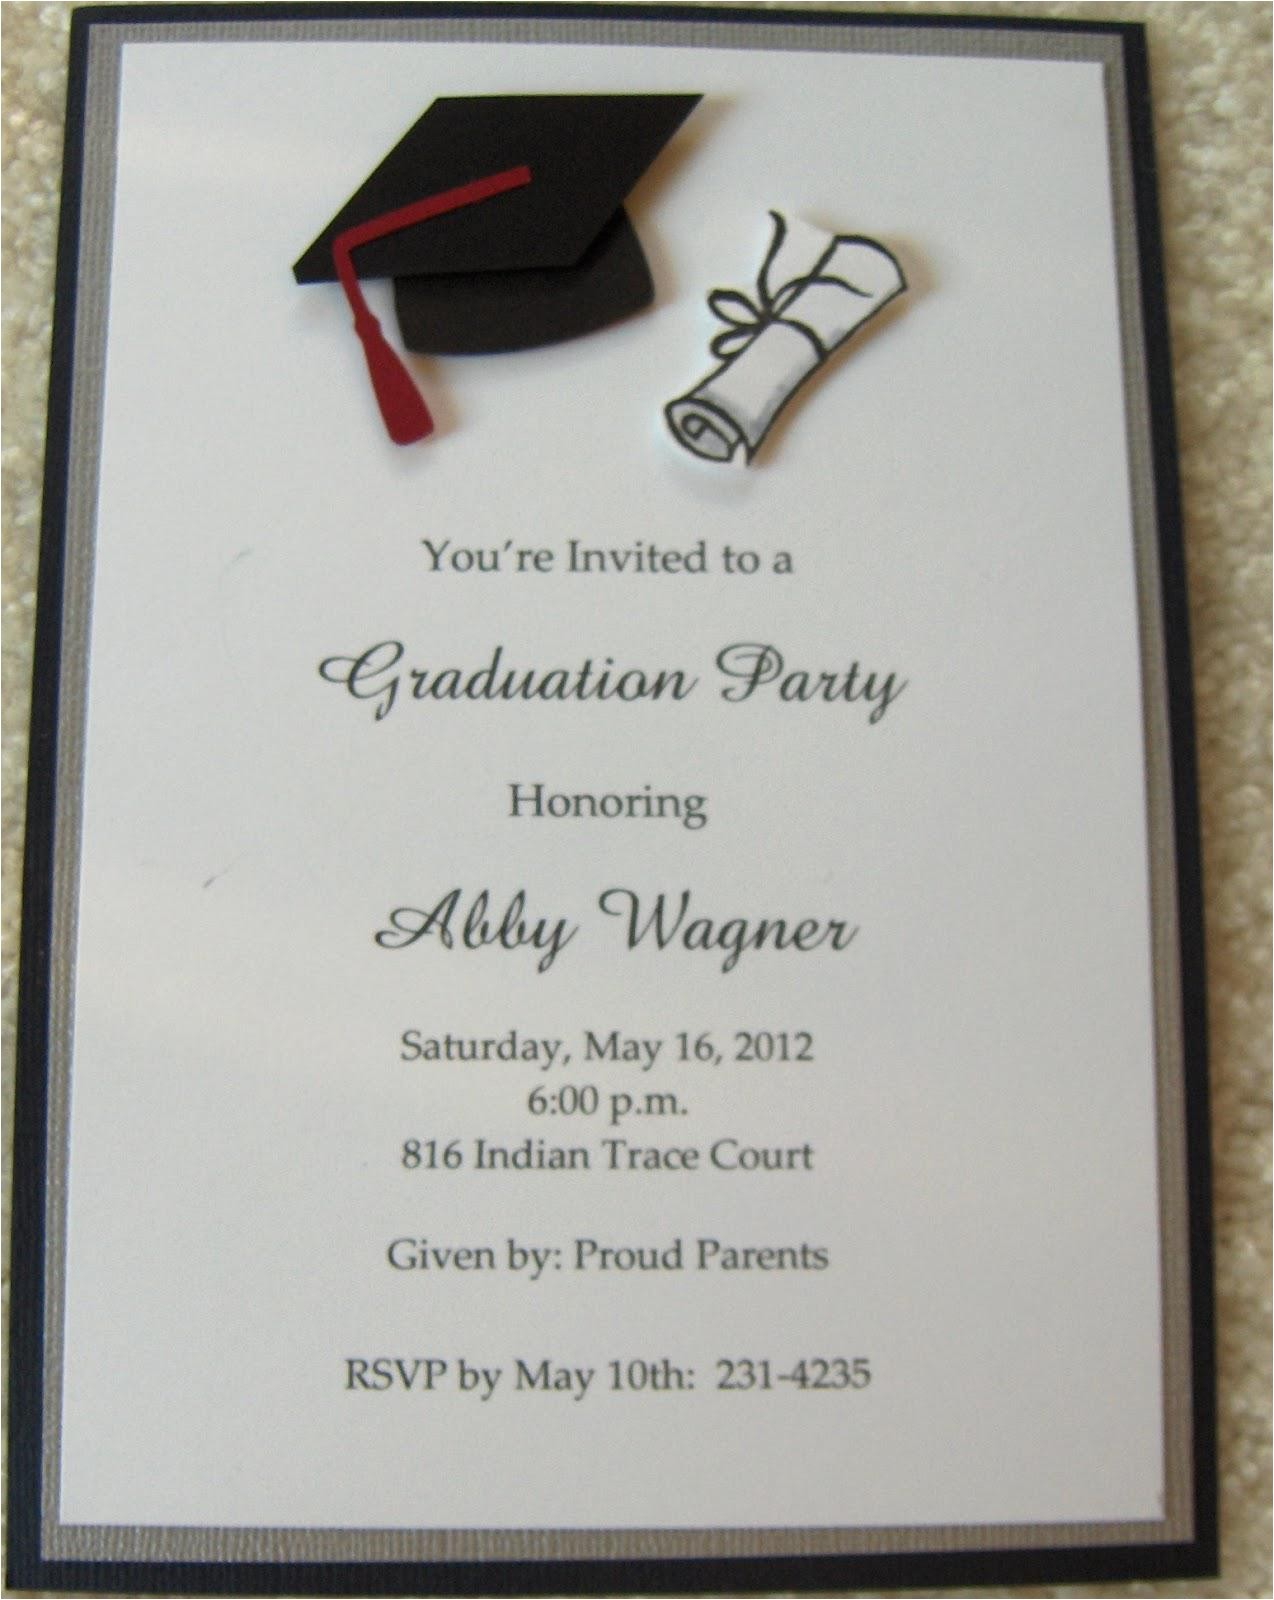 Pictures for Graduation Invitations College Graduation Party Invitations Party Invitations